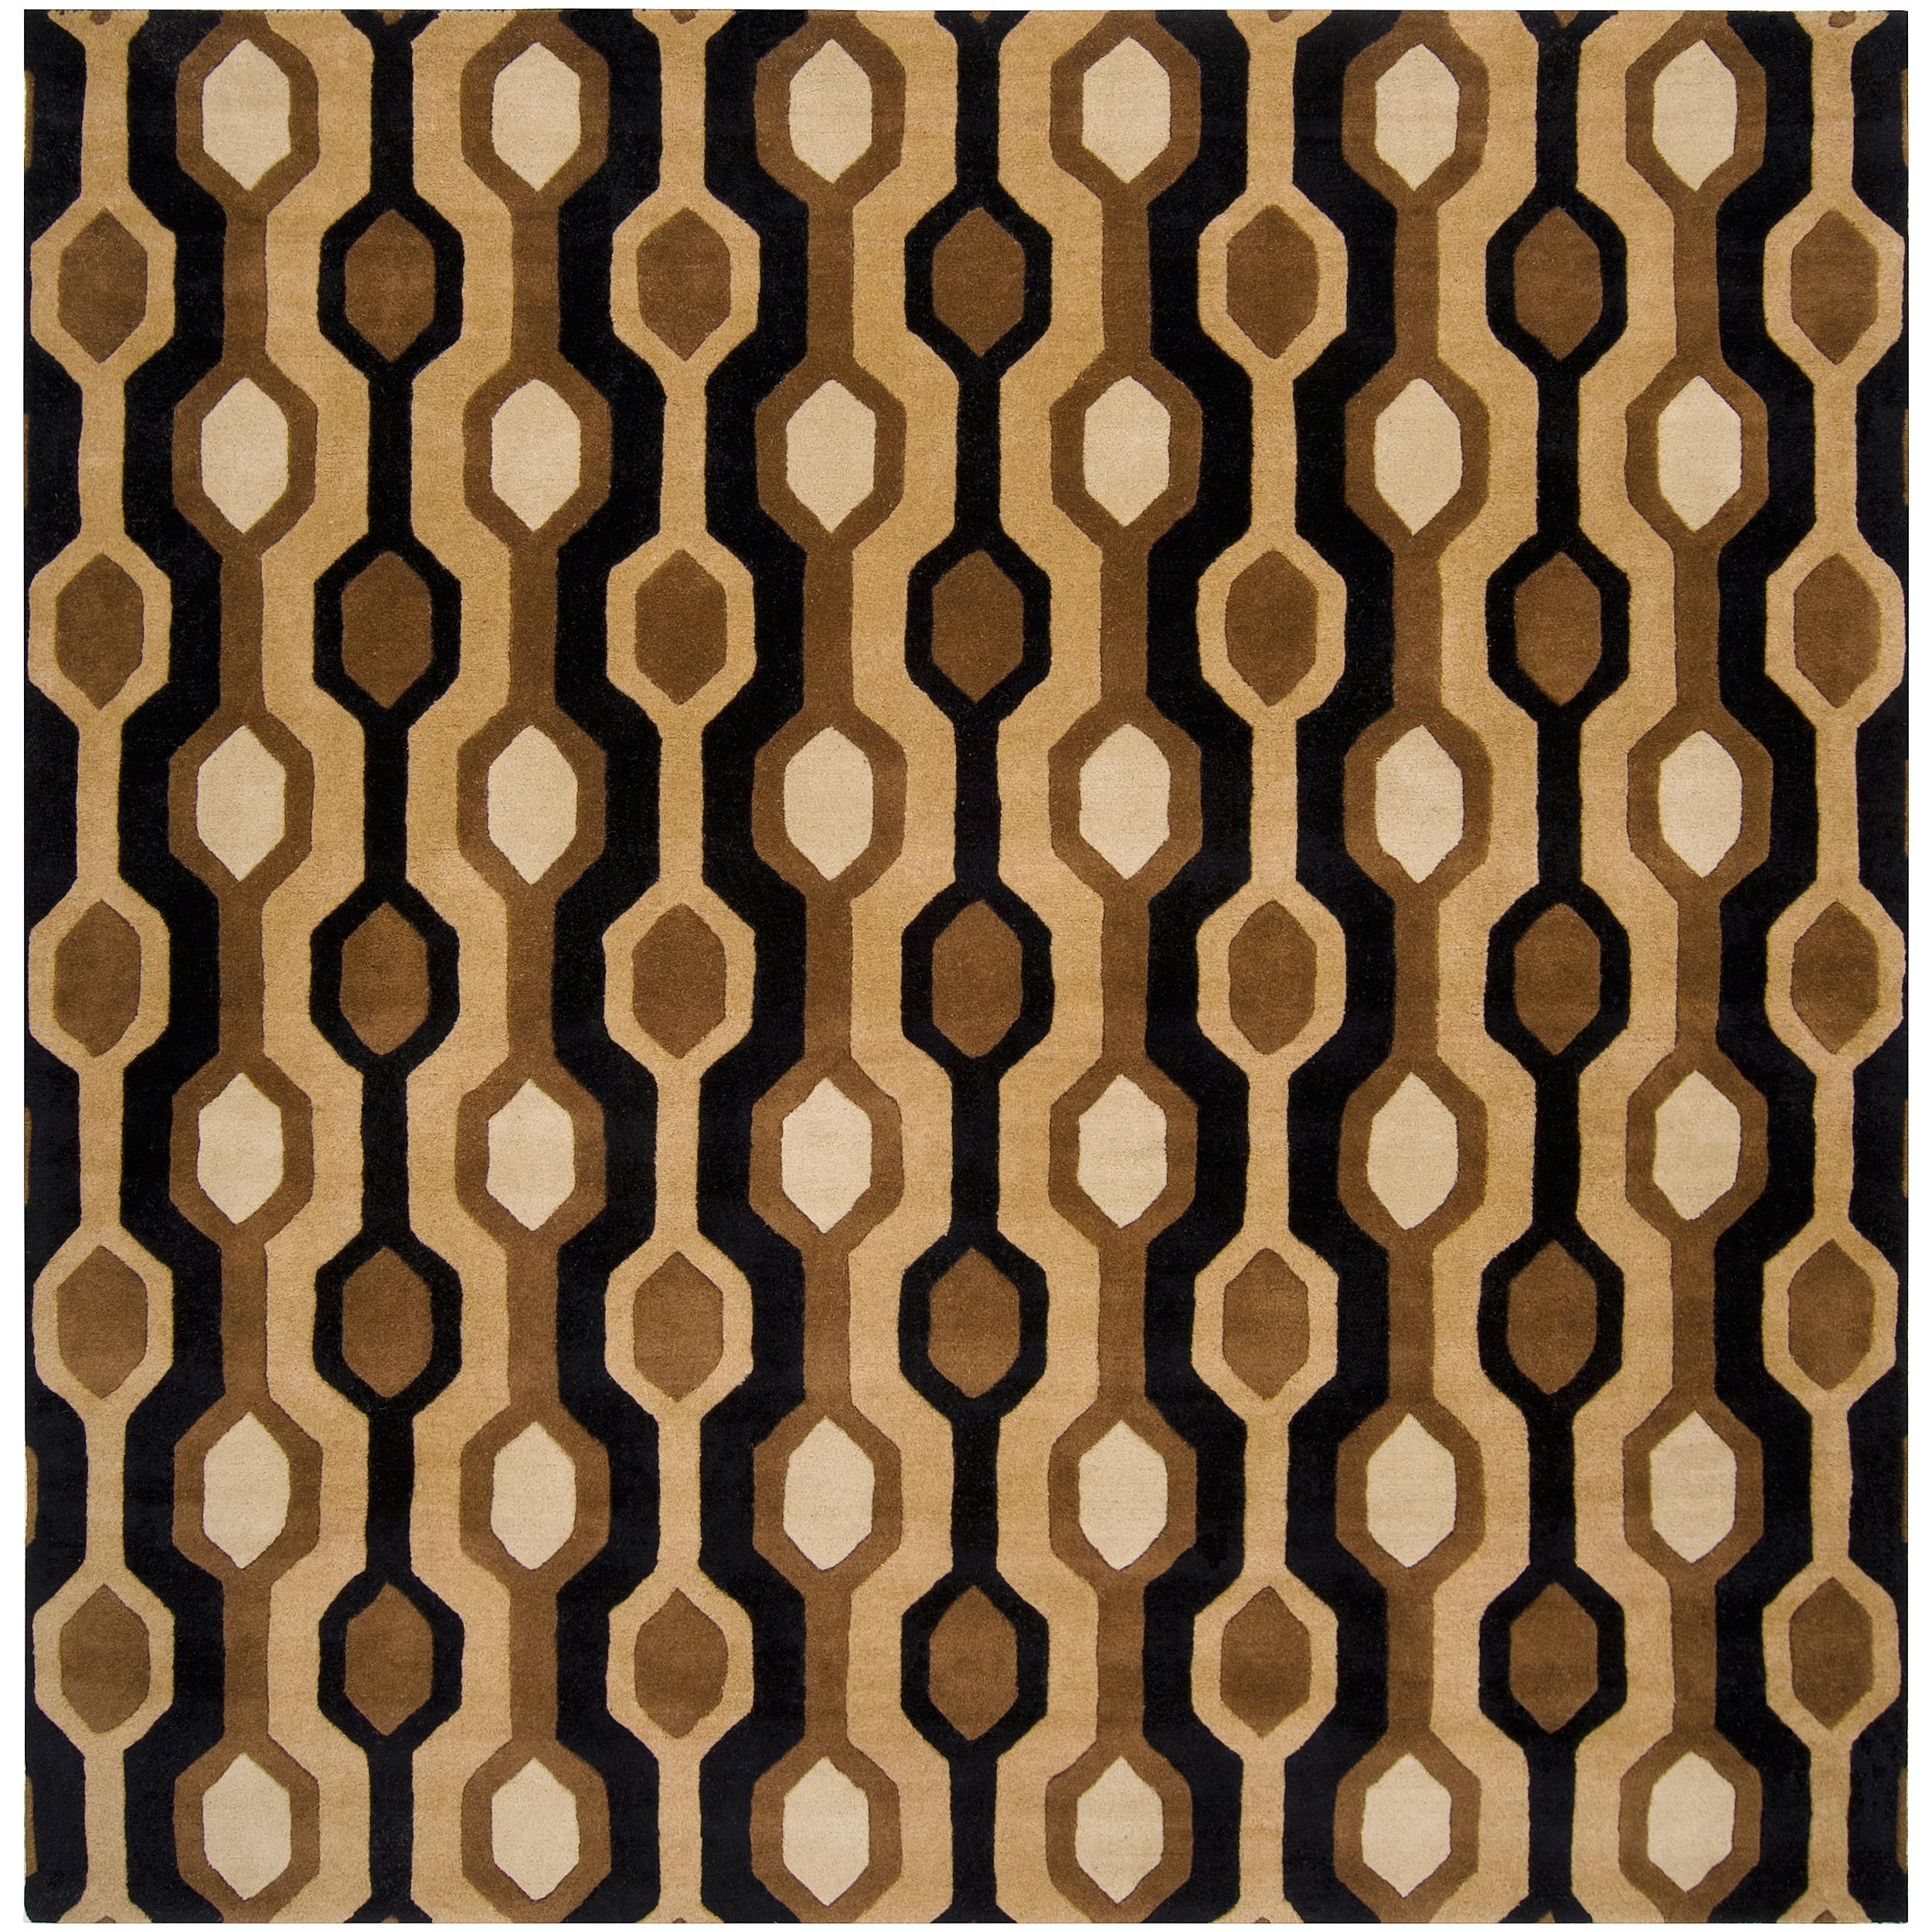 Hand-tufted Black Contemporary Letchworth Wool Geometric Rug (9'9 x 9'9)